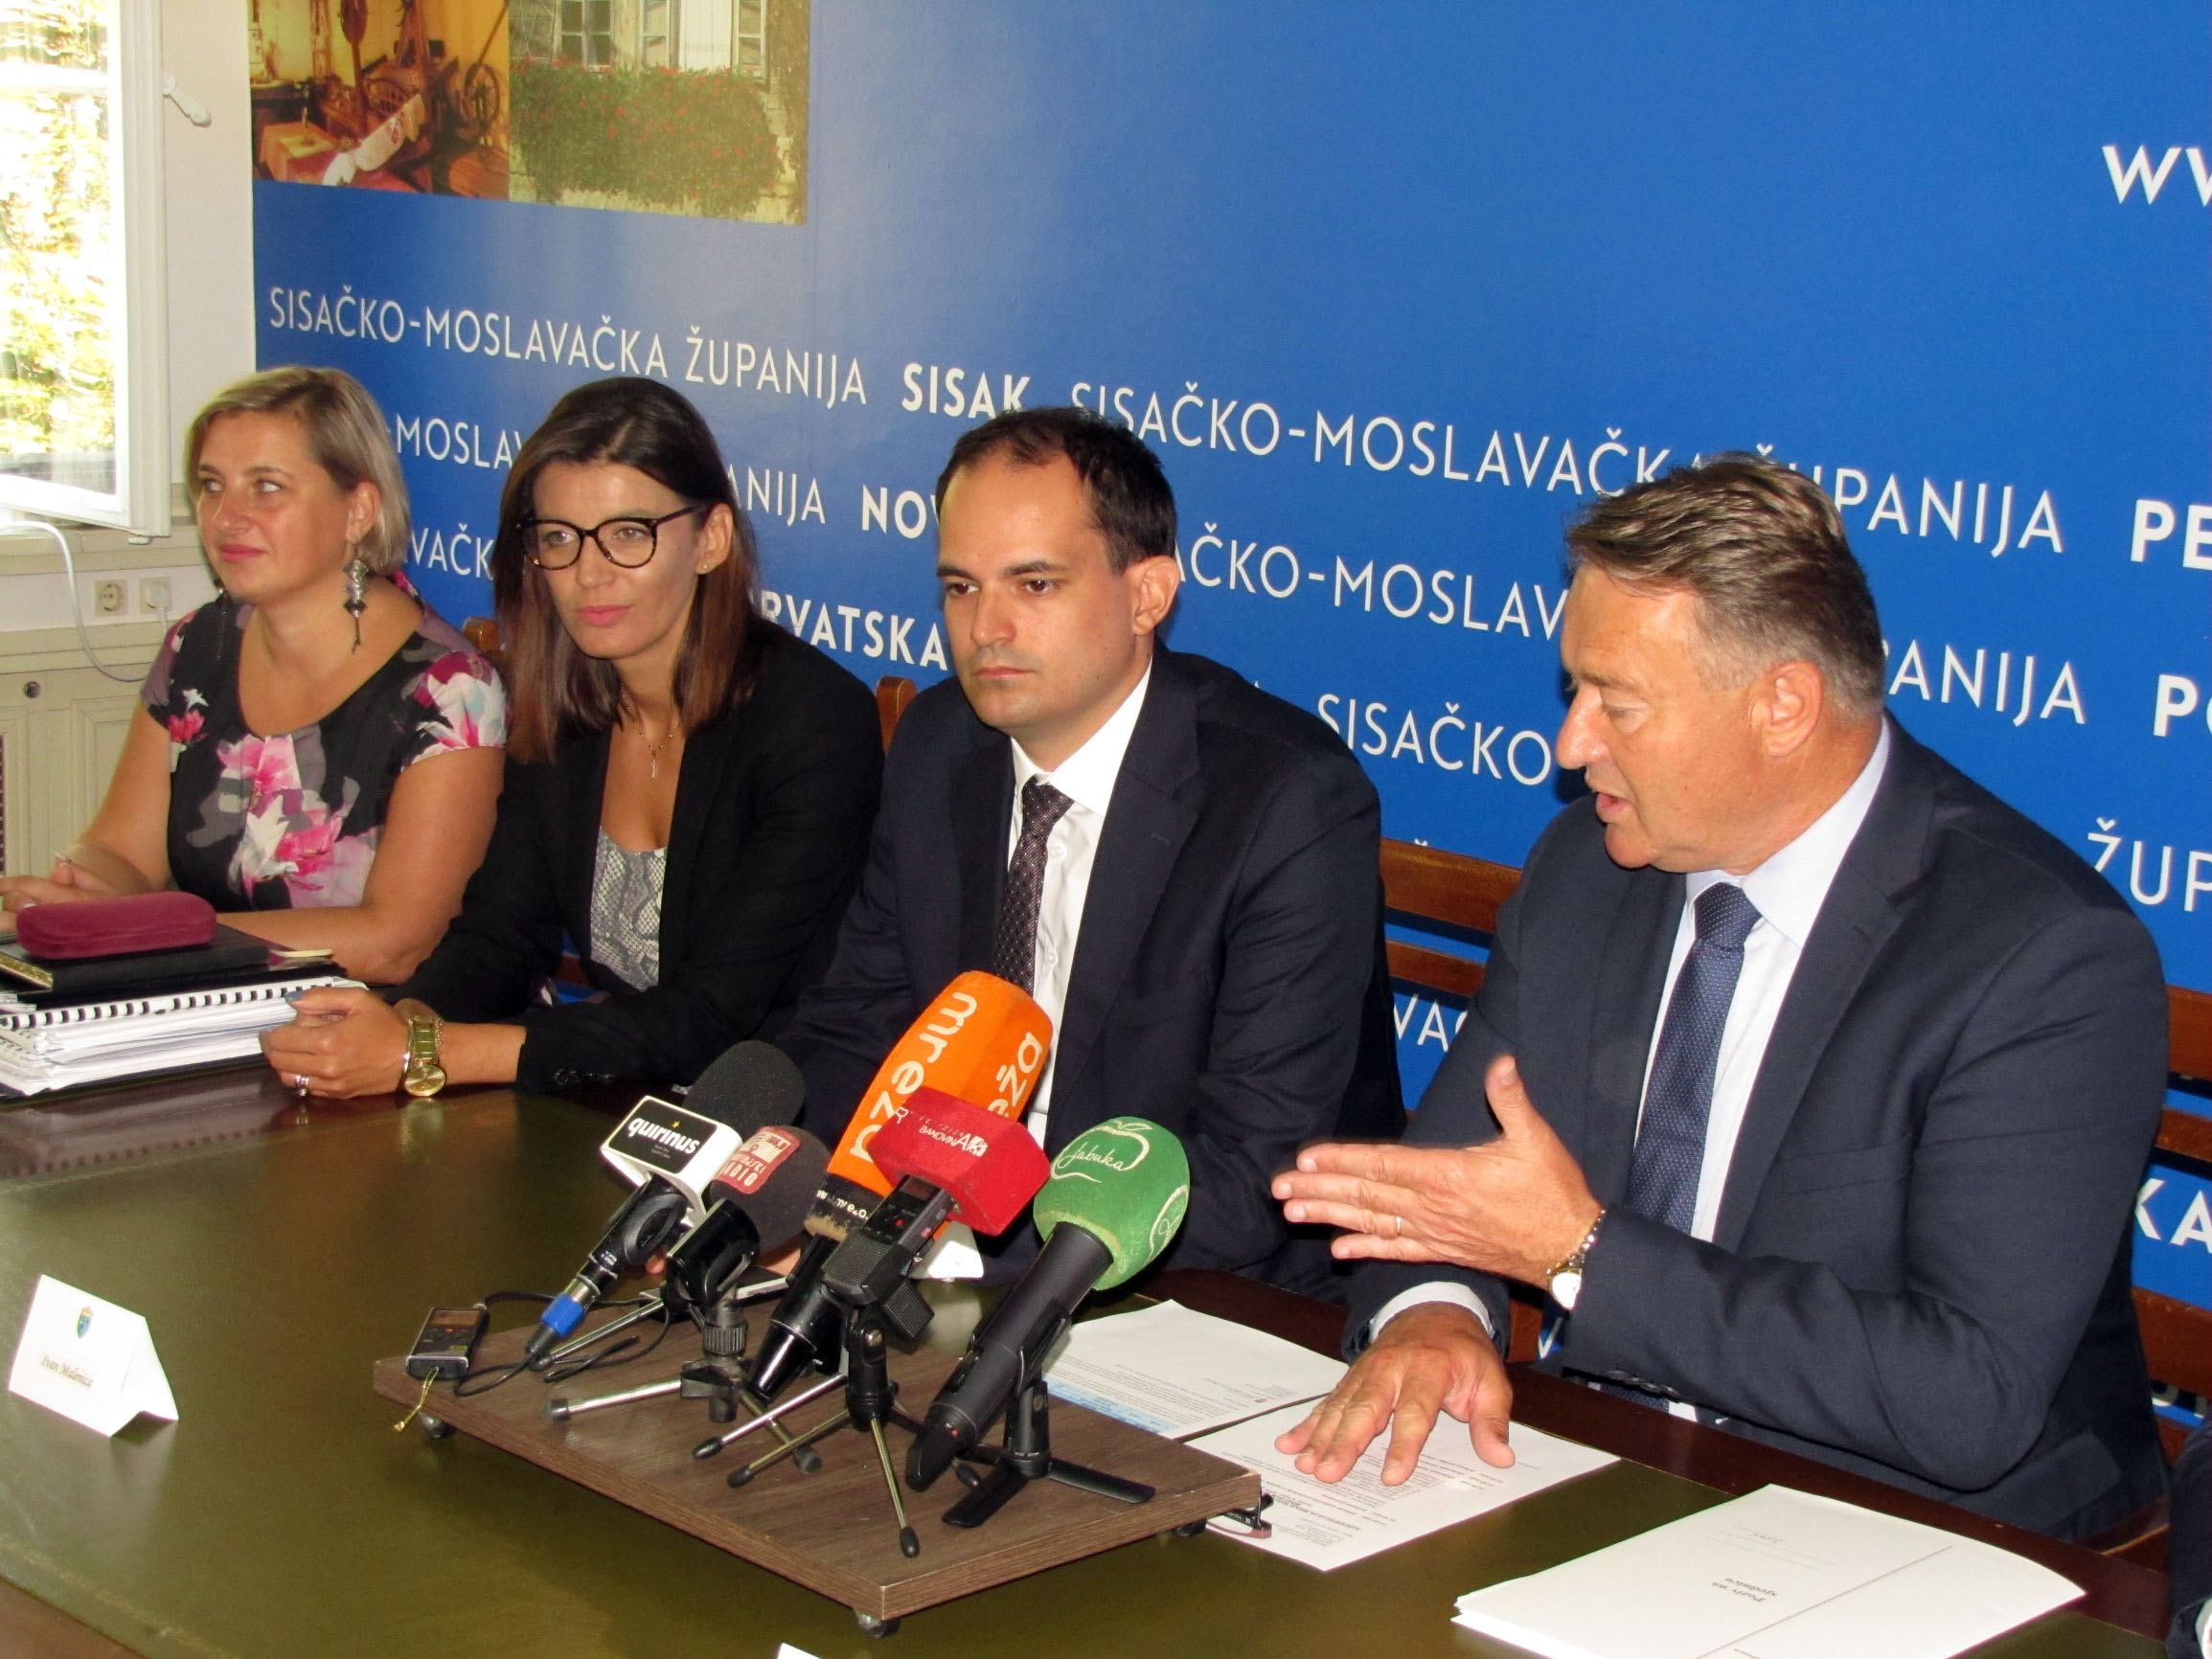 Silvija Desić Basarić, Josipa Rimac, ministar Ivan Malenica i župan Ivo Žinić